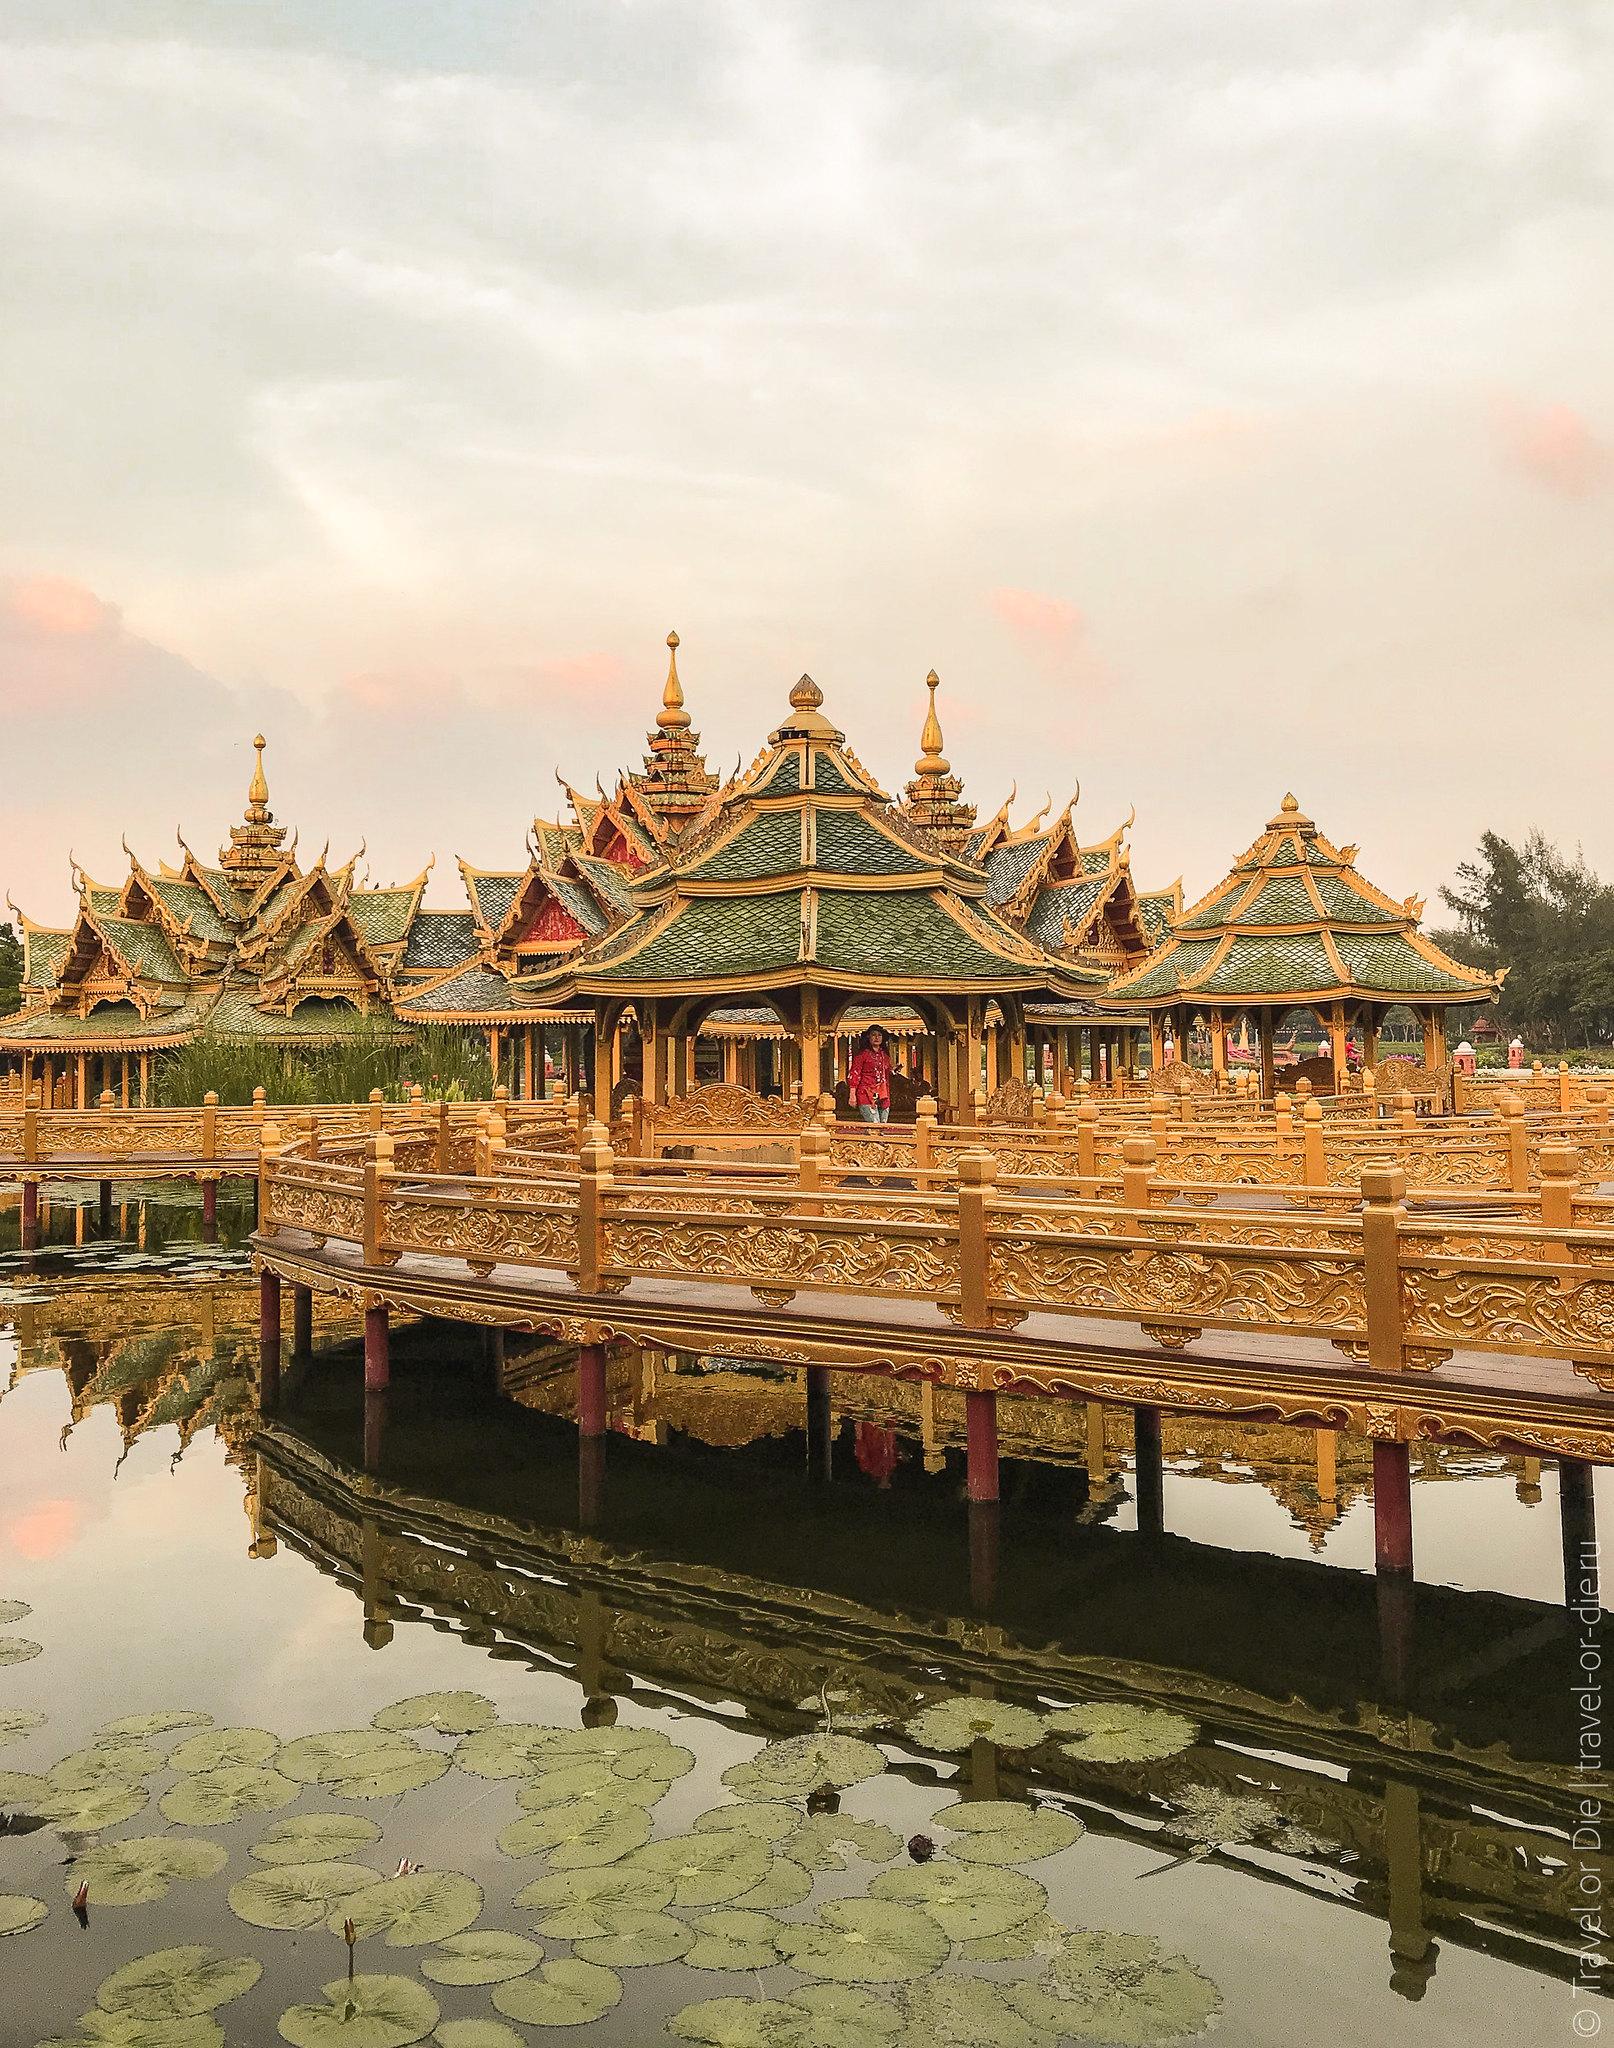 Ancient-City-Muang-Boran-Bangkok-9889